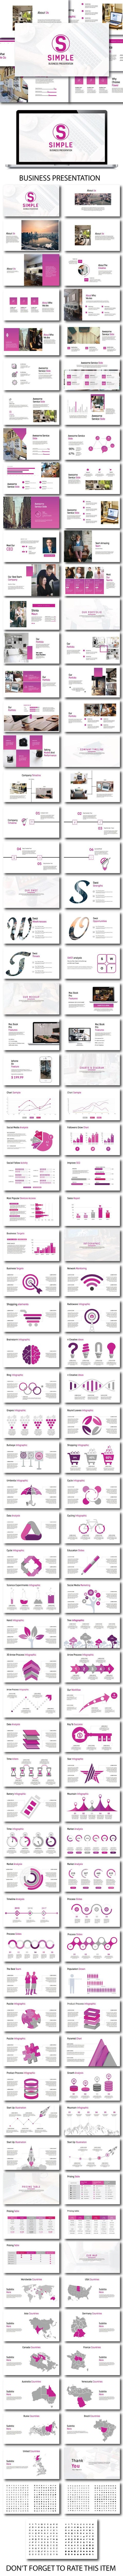 GraphicRiver Simple Multipurpose Presentation 20804824